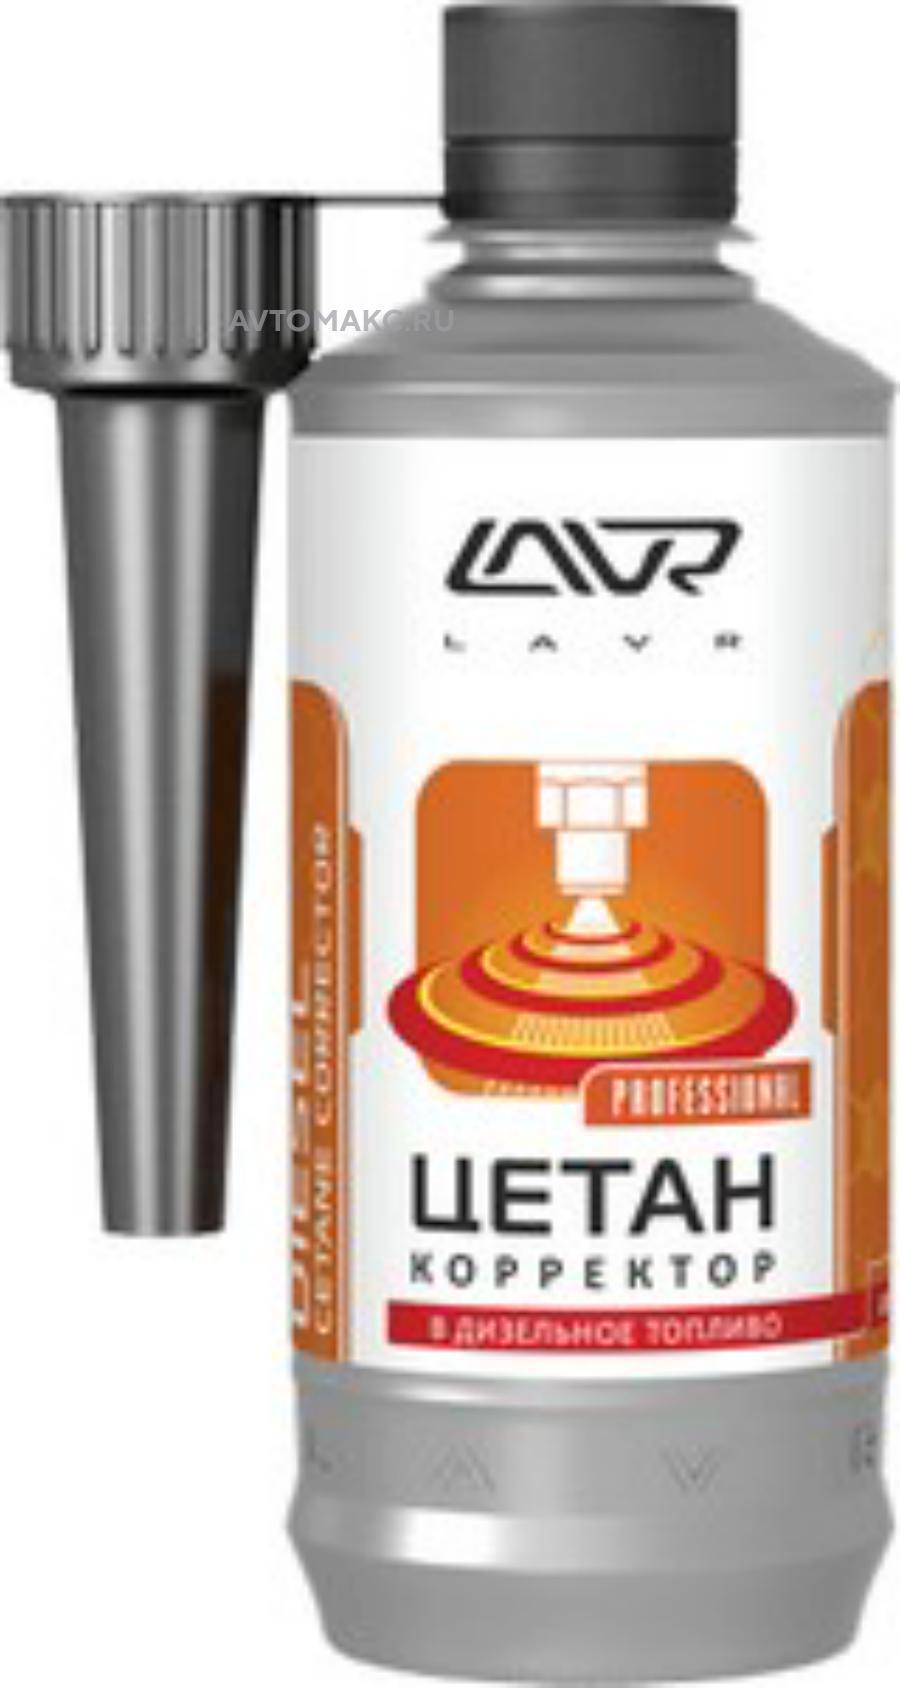 Цетан Плюс присадка в дизельное топливо (на 40-60 л) LAVR Cetane Plus (LN2112)